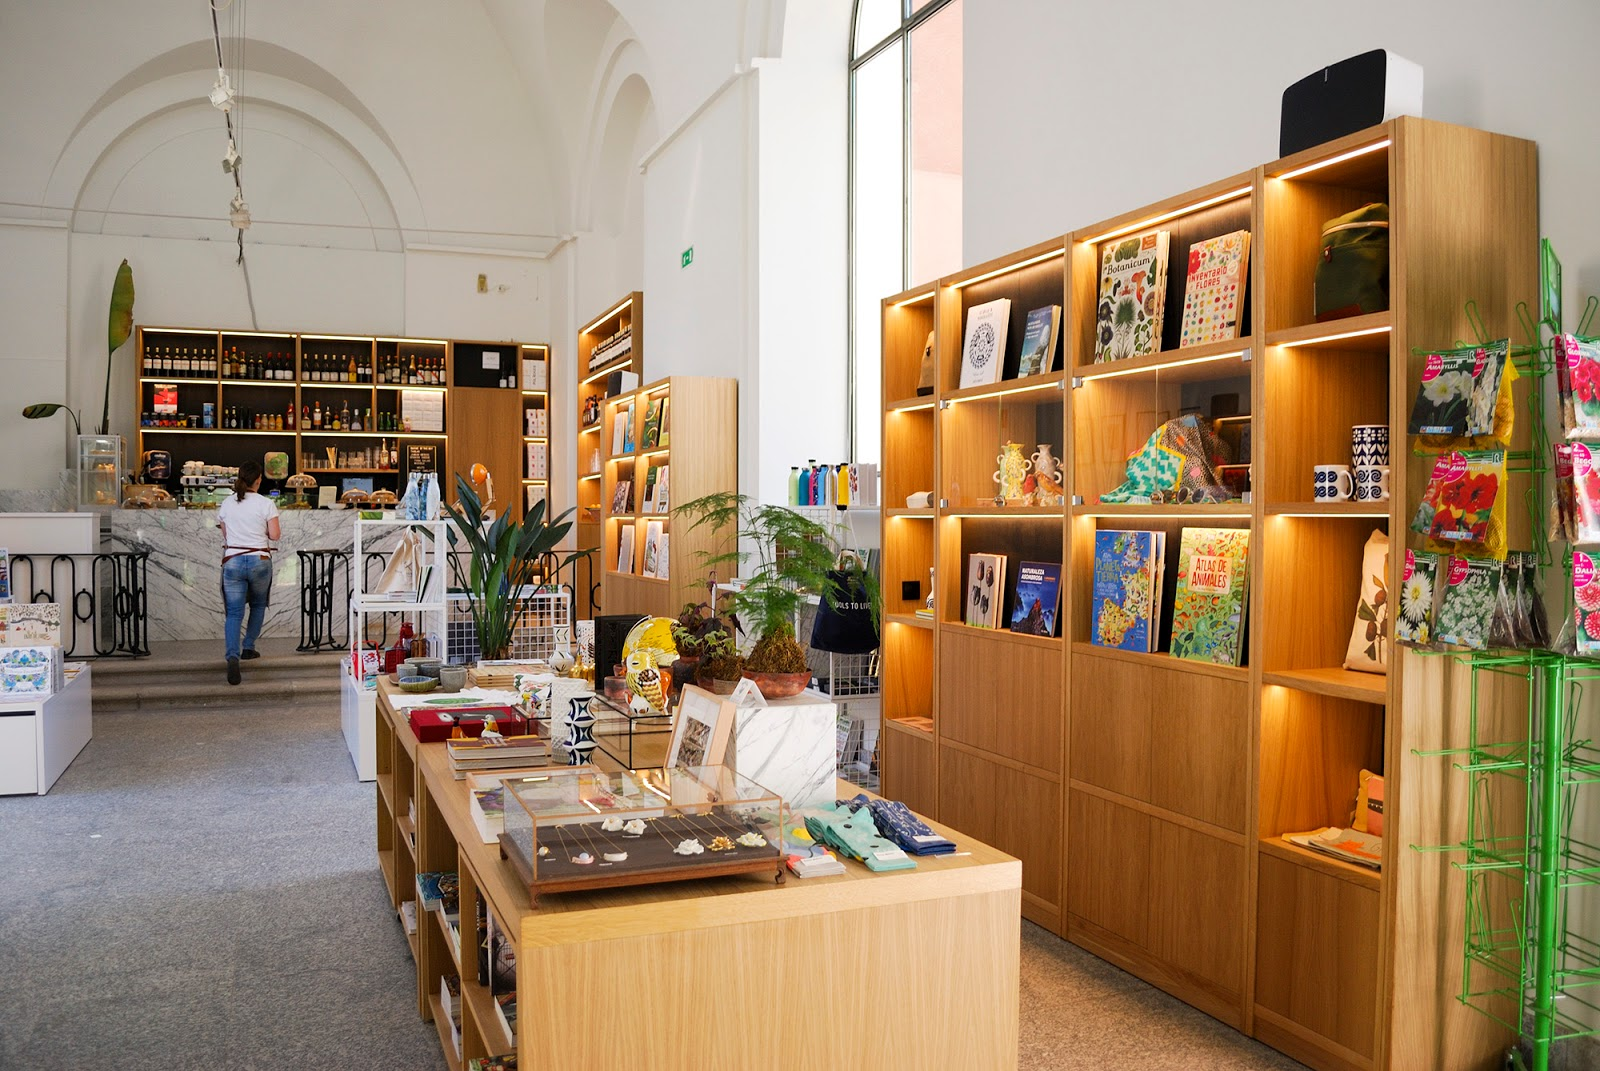 La Catedra cafe shop Royal Botanic Gardens Madrid Spain